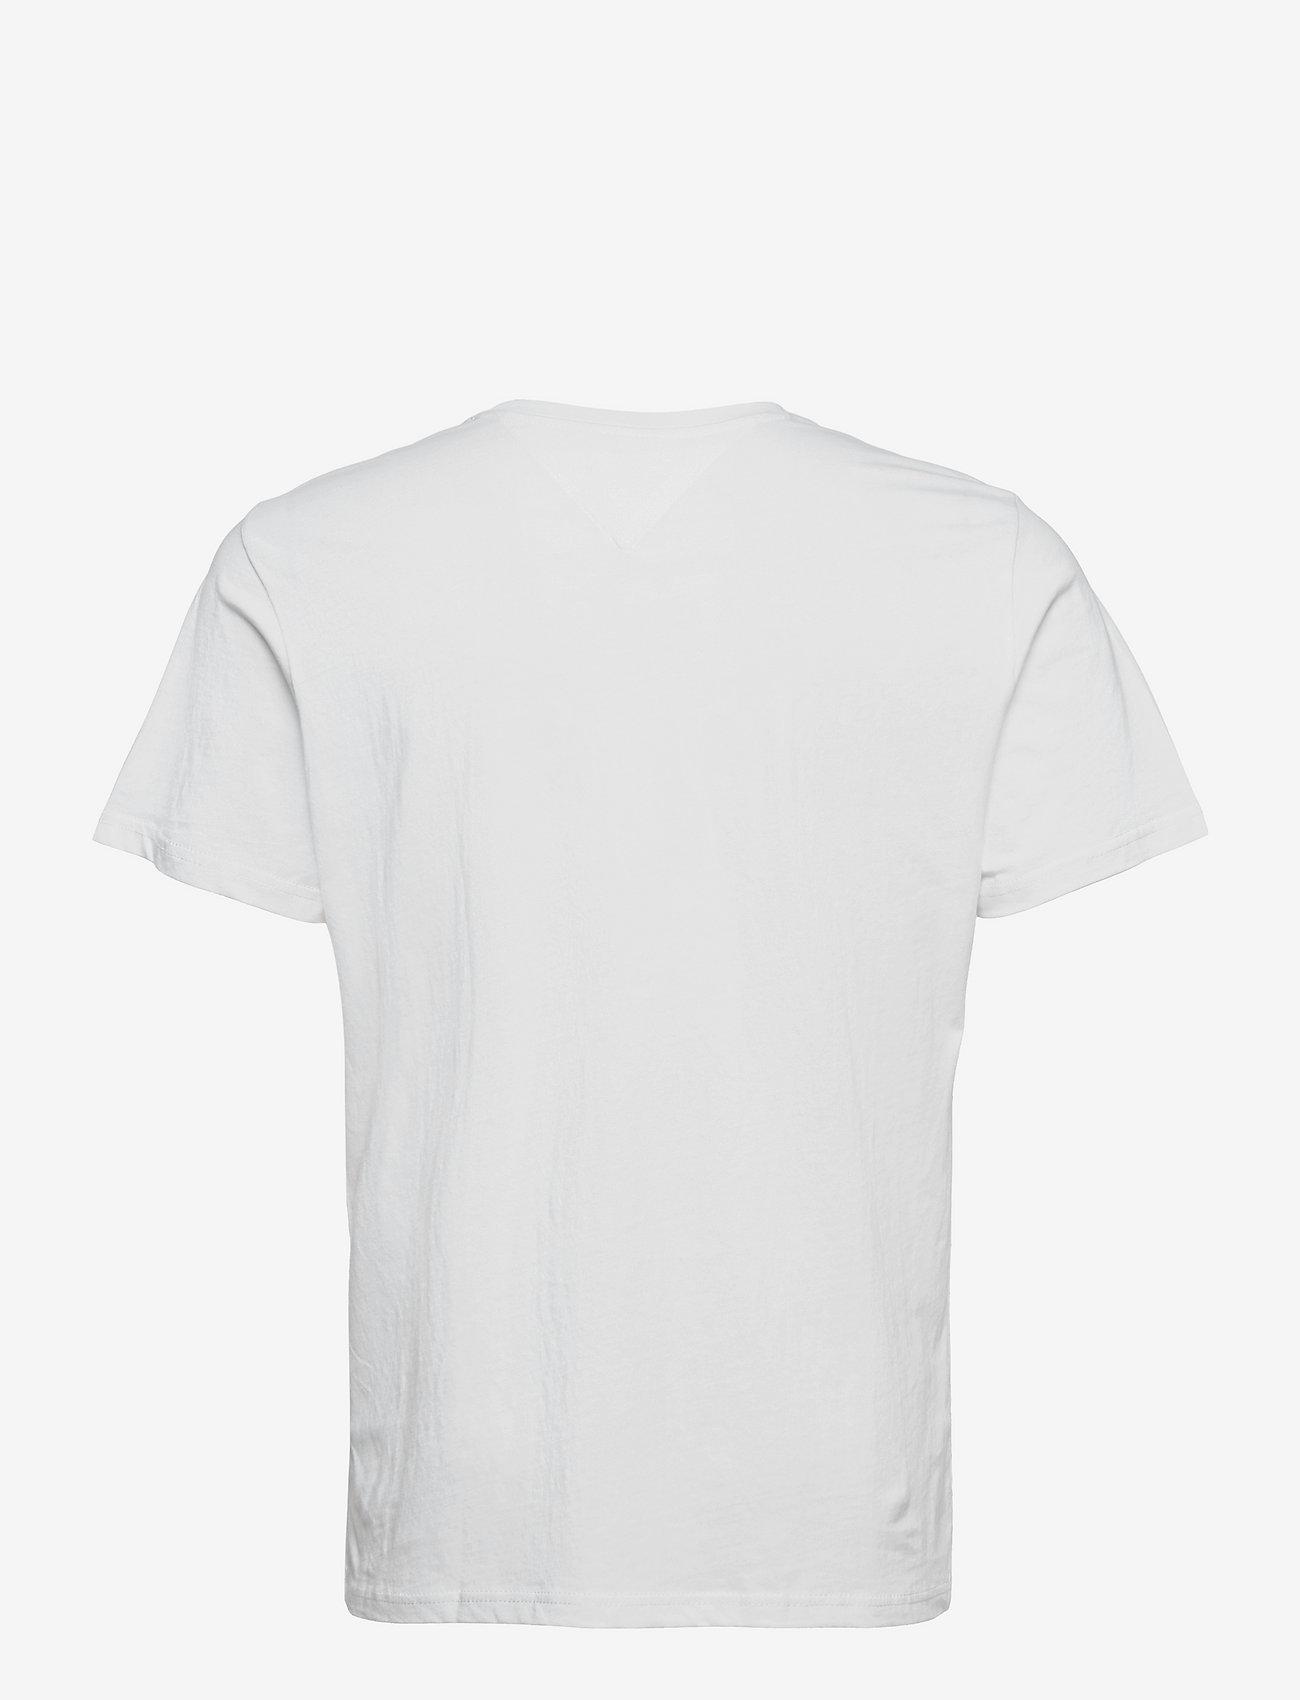 Tommy Jeans - TJM CORP LOGO TEE - kortärmade t-shirts - white - 1